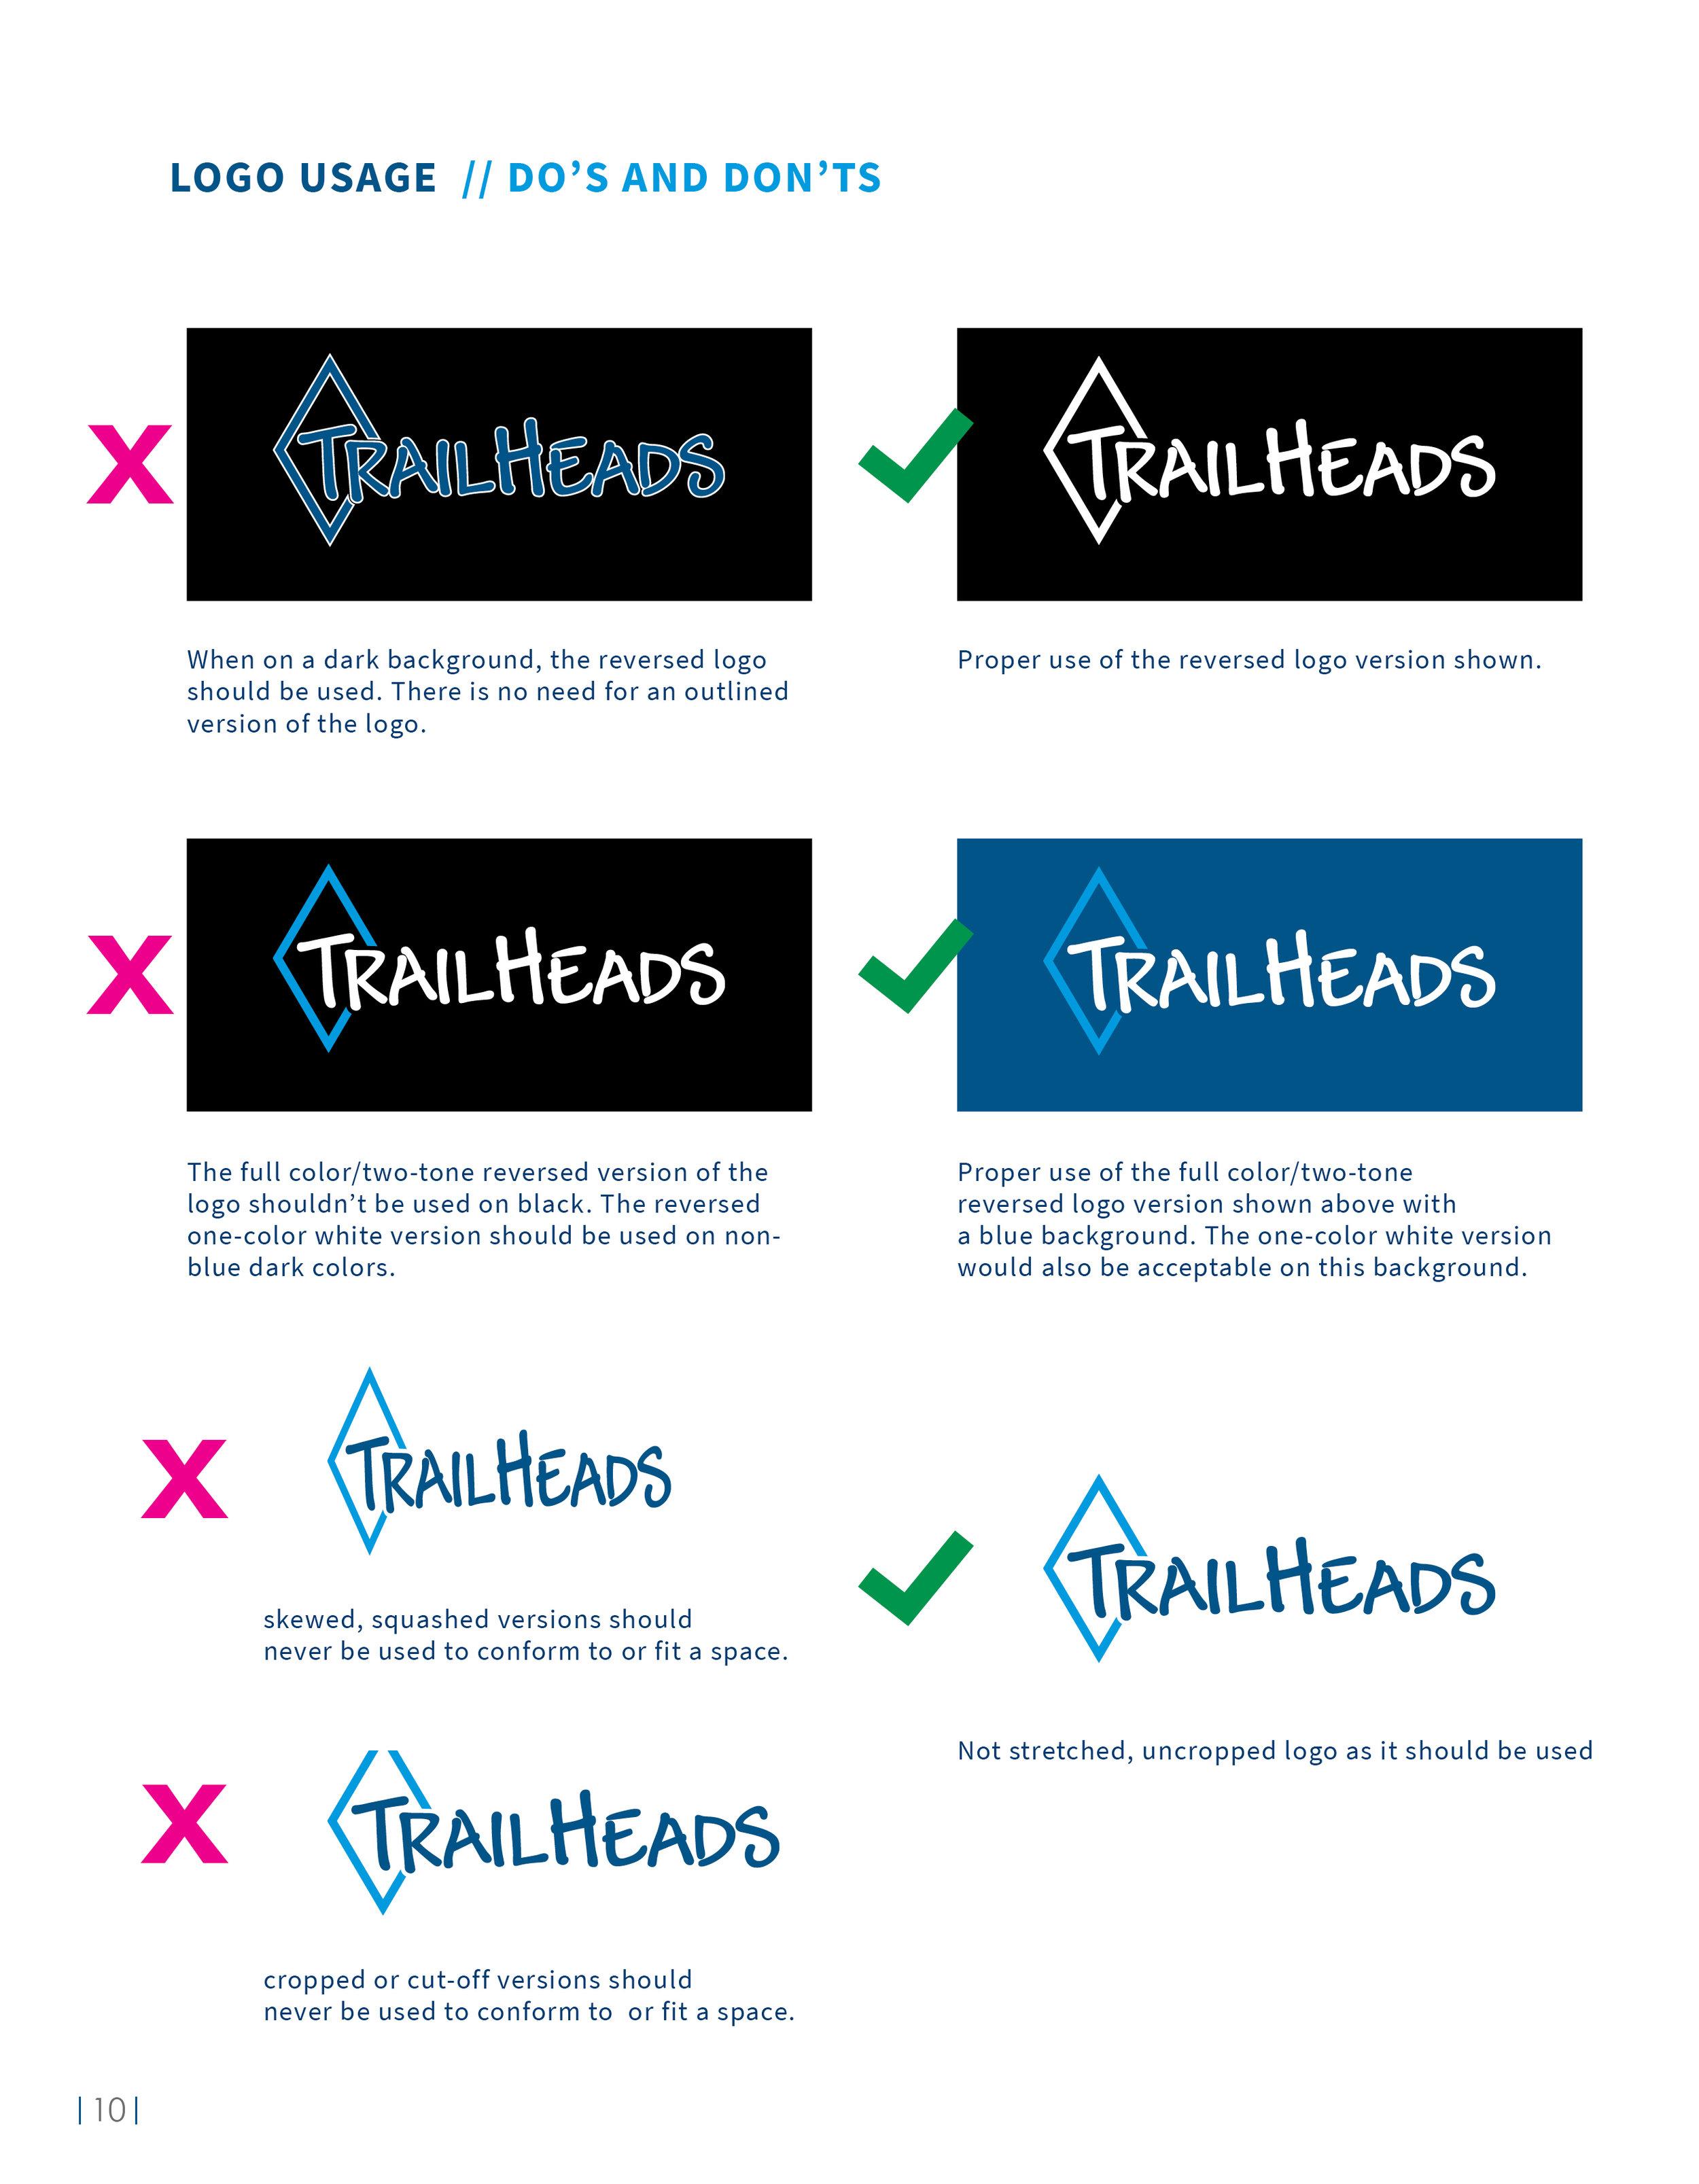 apparel-company-brand-guidelines-design-by-jordan-fretz-design-110.jpg